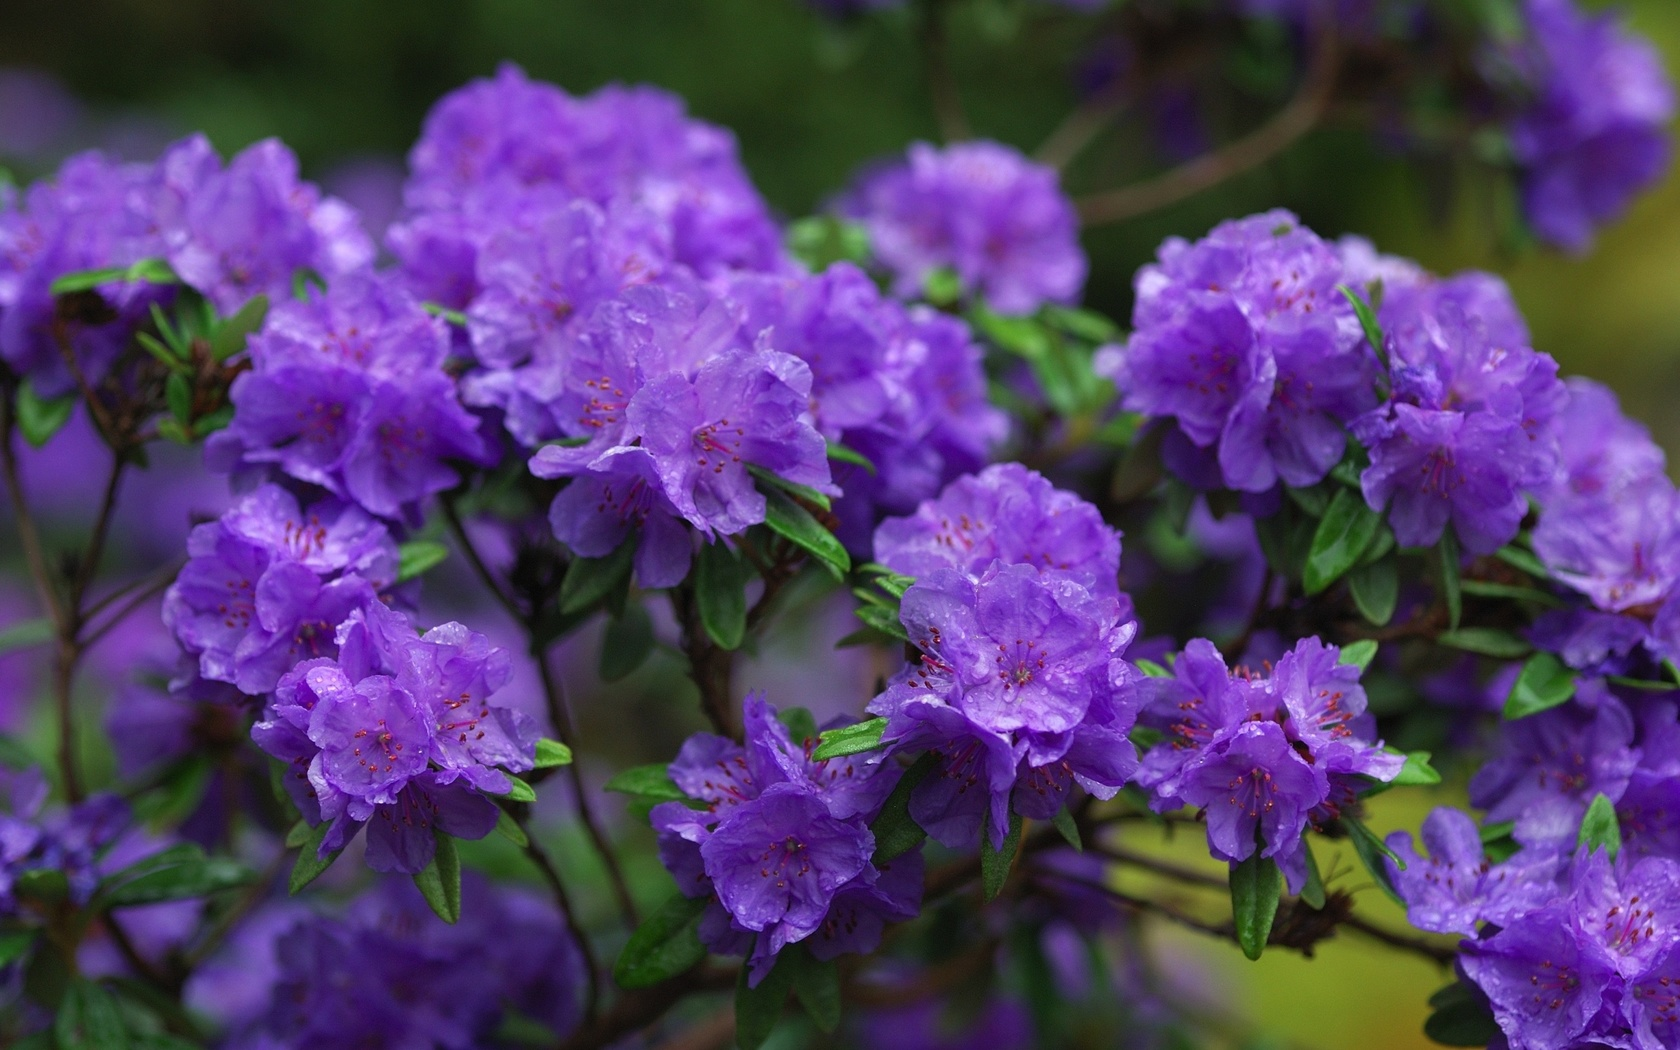 цветы, ветки, фиолетовый, азалии, азалия, рододендроны, flowers, branches, purple, azaleas, azalea, rhododendrons